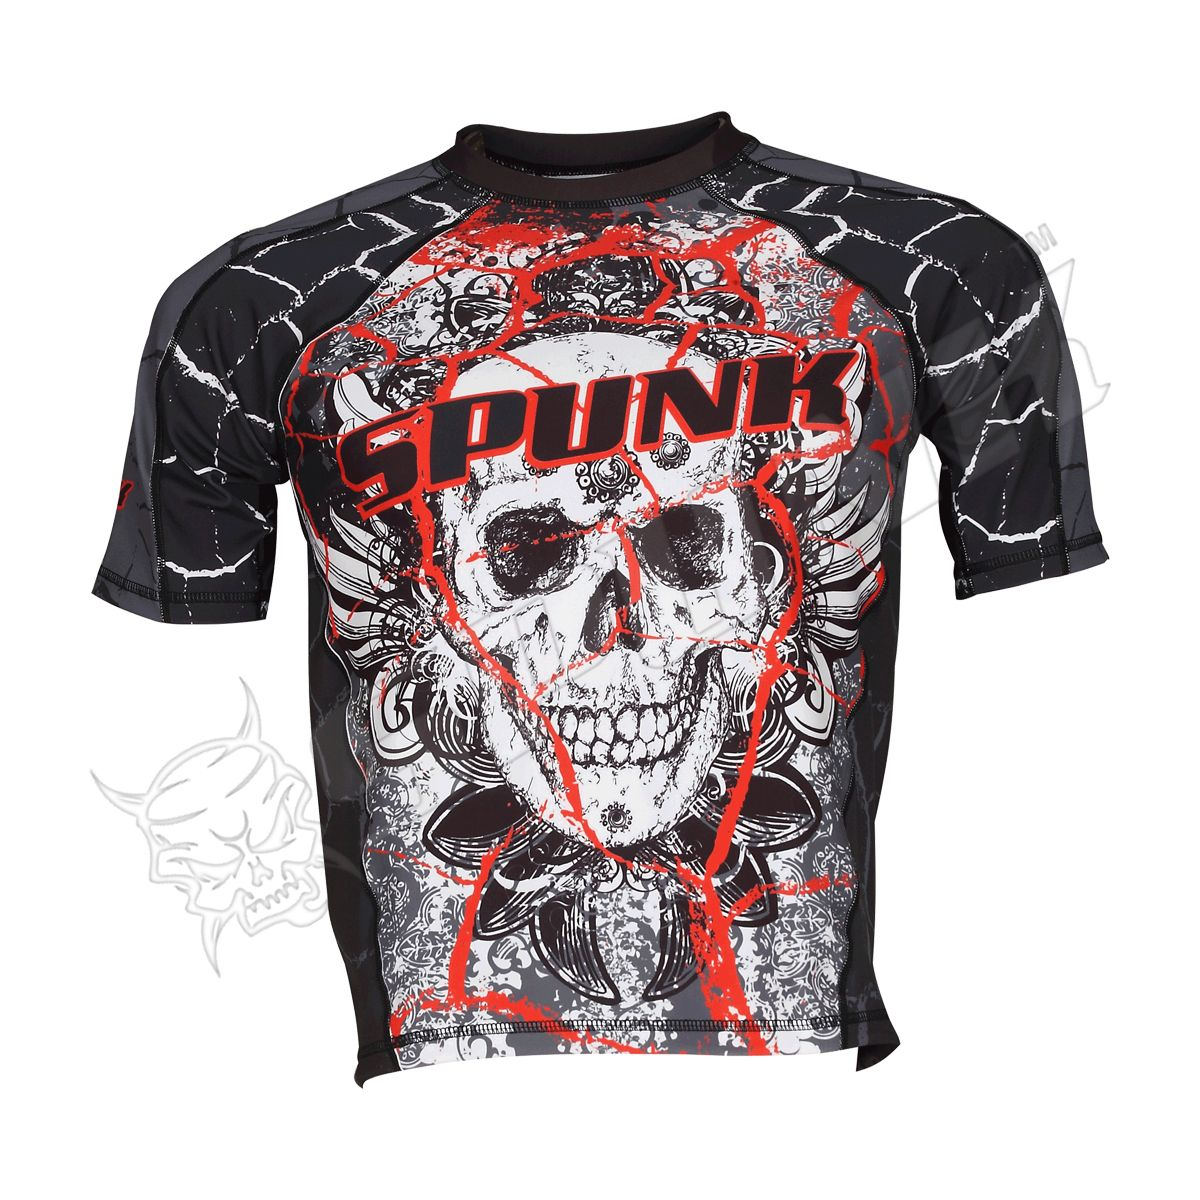 DEVIL MMA Rash Gurad, MMA Clothing, MMA Fight Gear